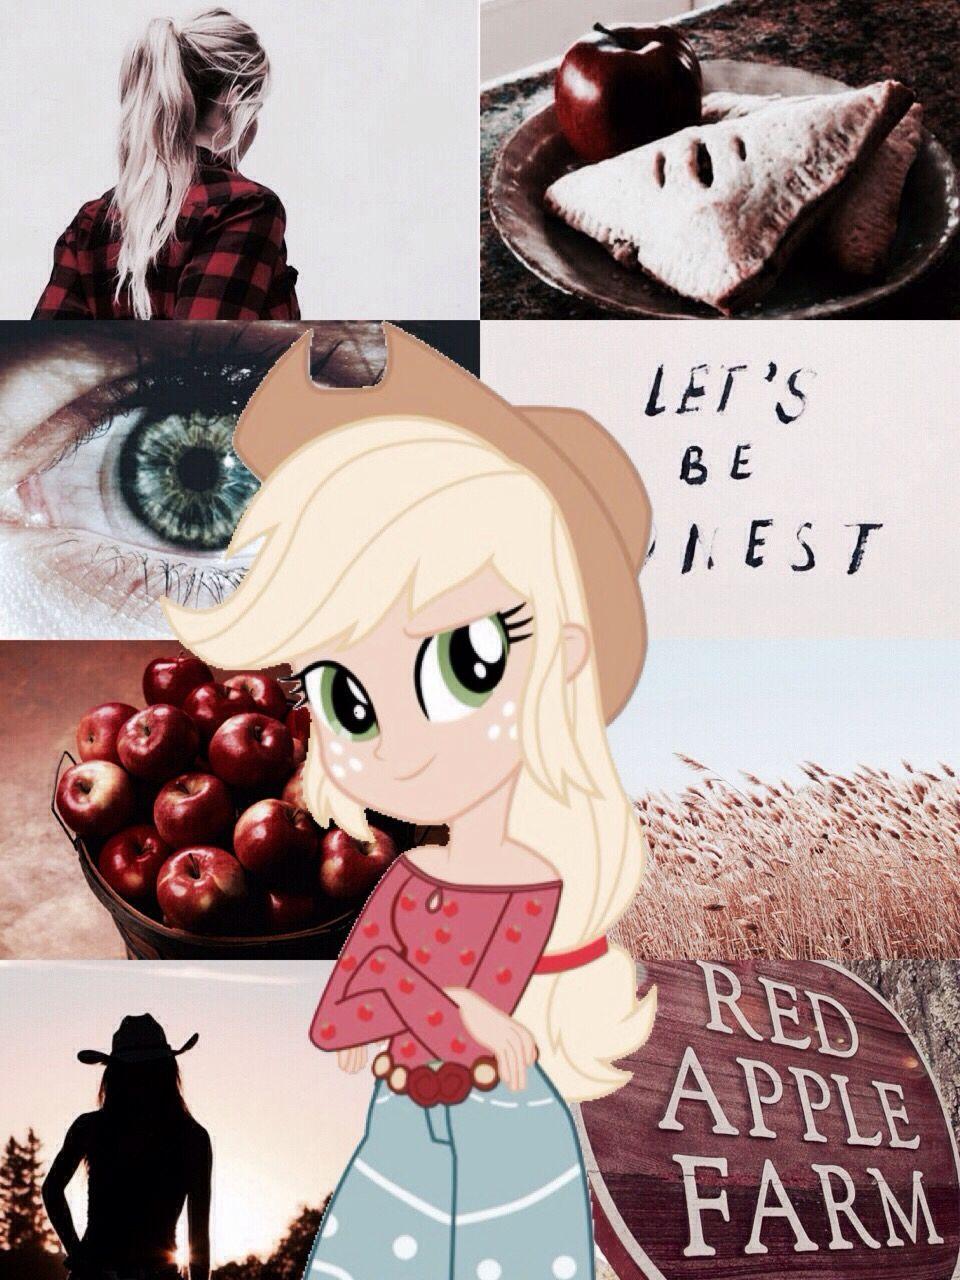 My Little Pony Equestria Girls Aesthetic Applejack My Little Pony Applejack My Little Pony Wallpaper My Little Pony Twilight